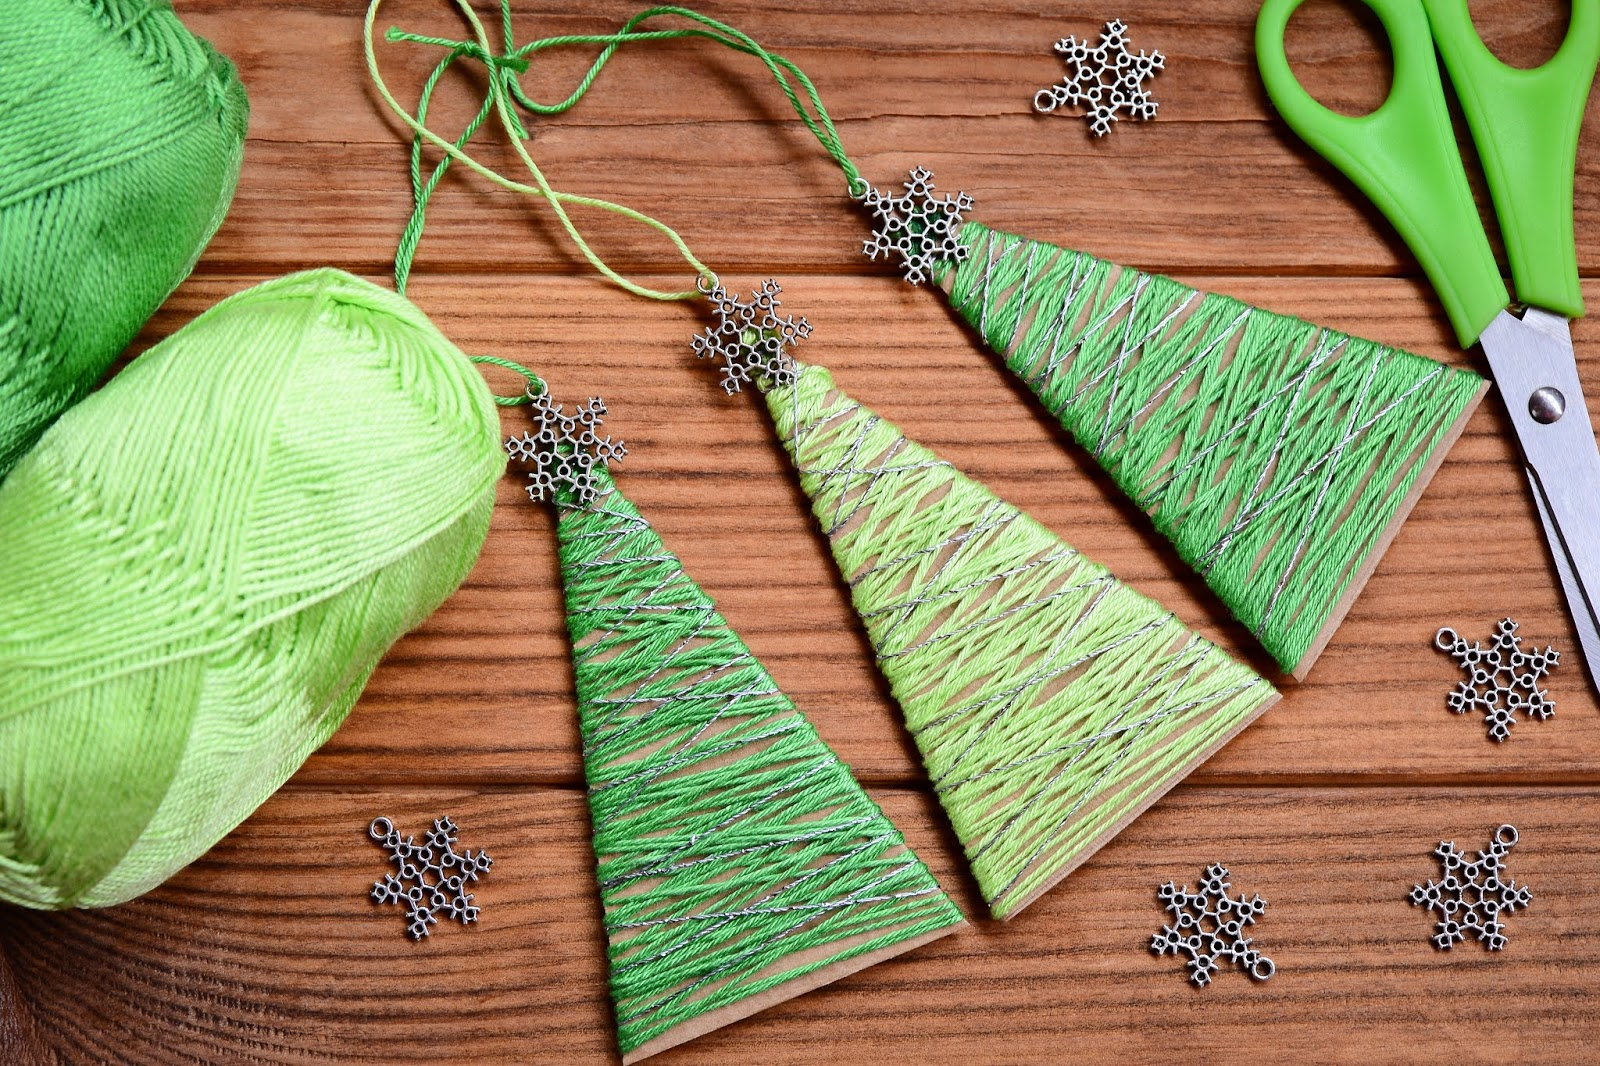 Manualidades navideñas con cartón y lana